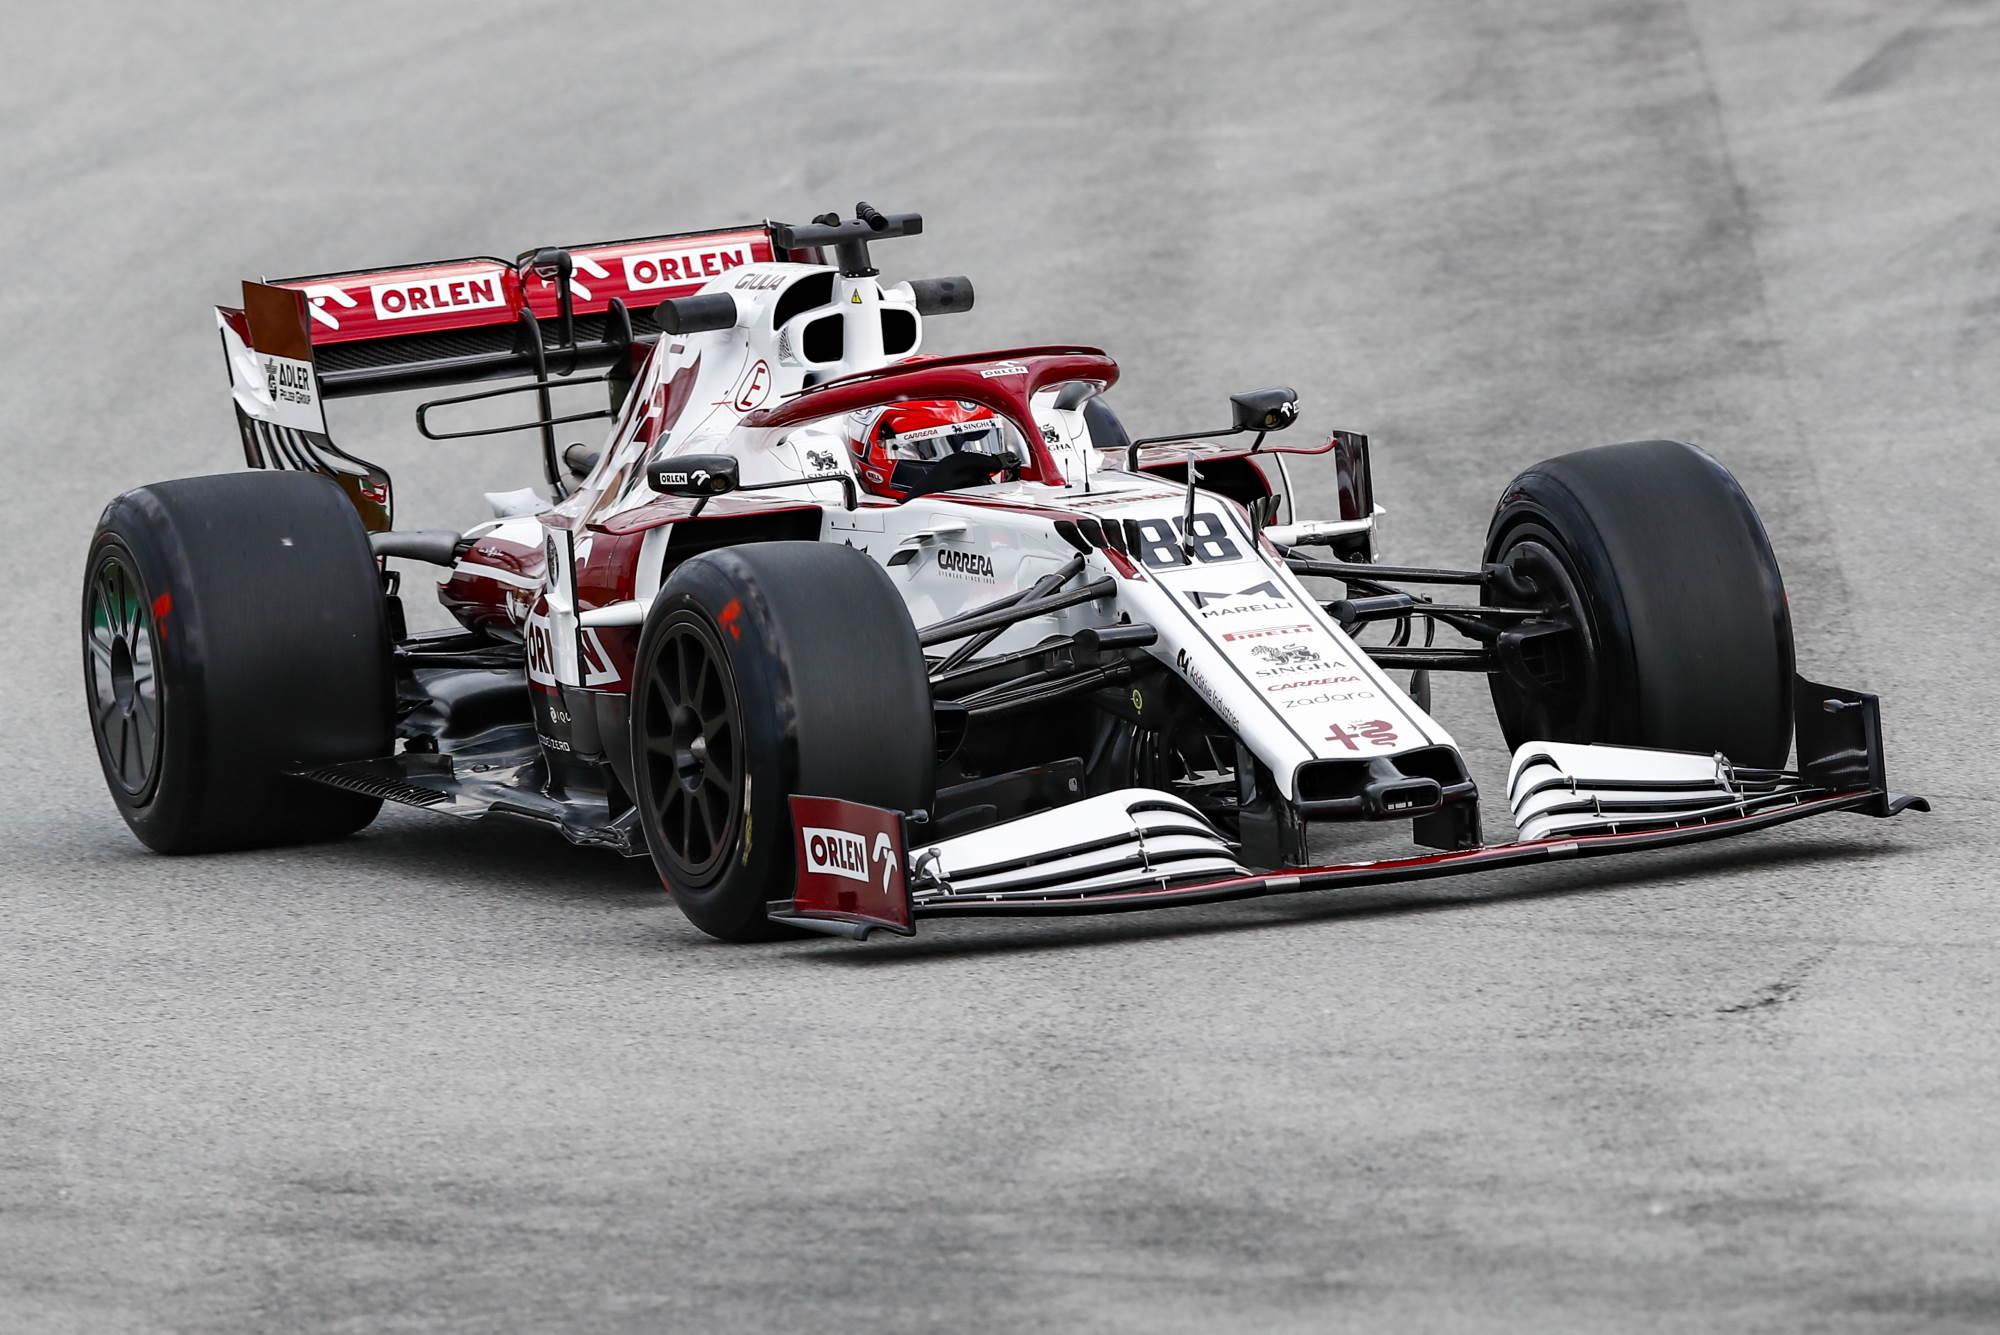 2021 In-Season Test - Spain Kubica Alfa Romeo C39 18-inch Pirelli tyres with rear wheel covers 3 Photo Alfa Romeo